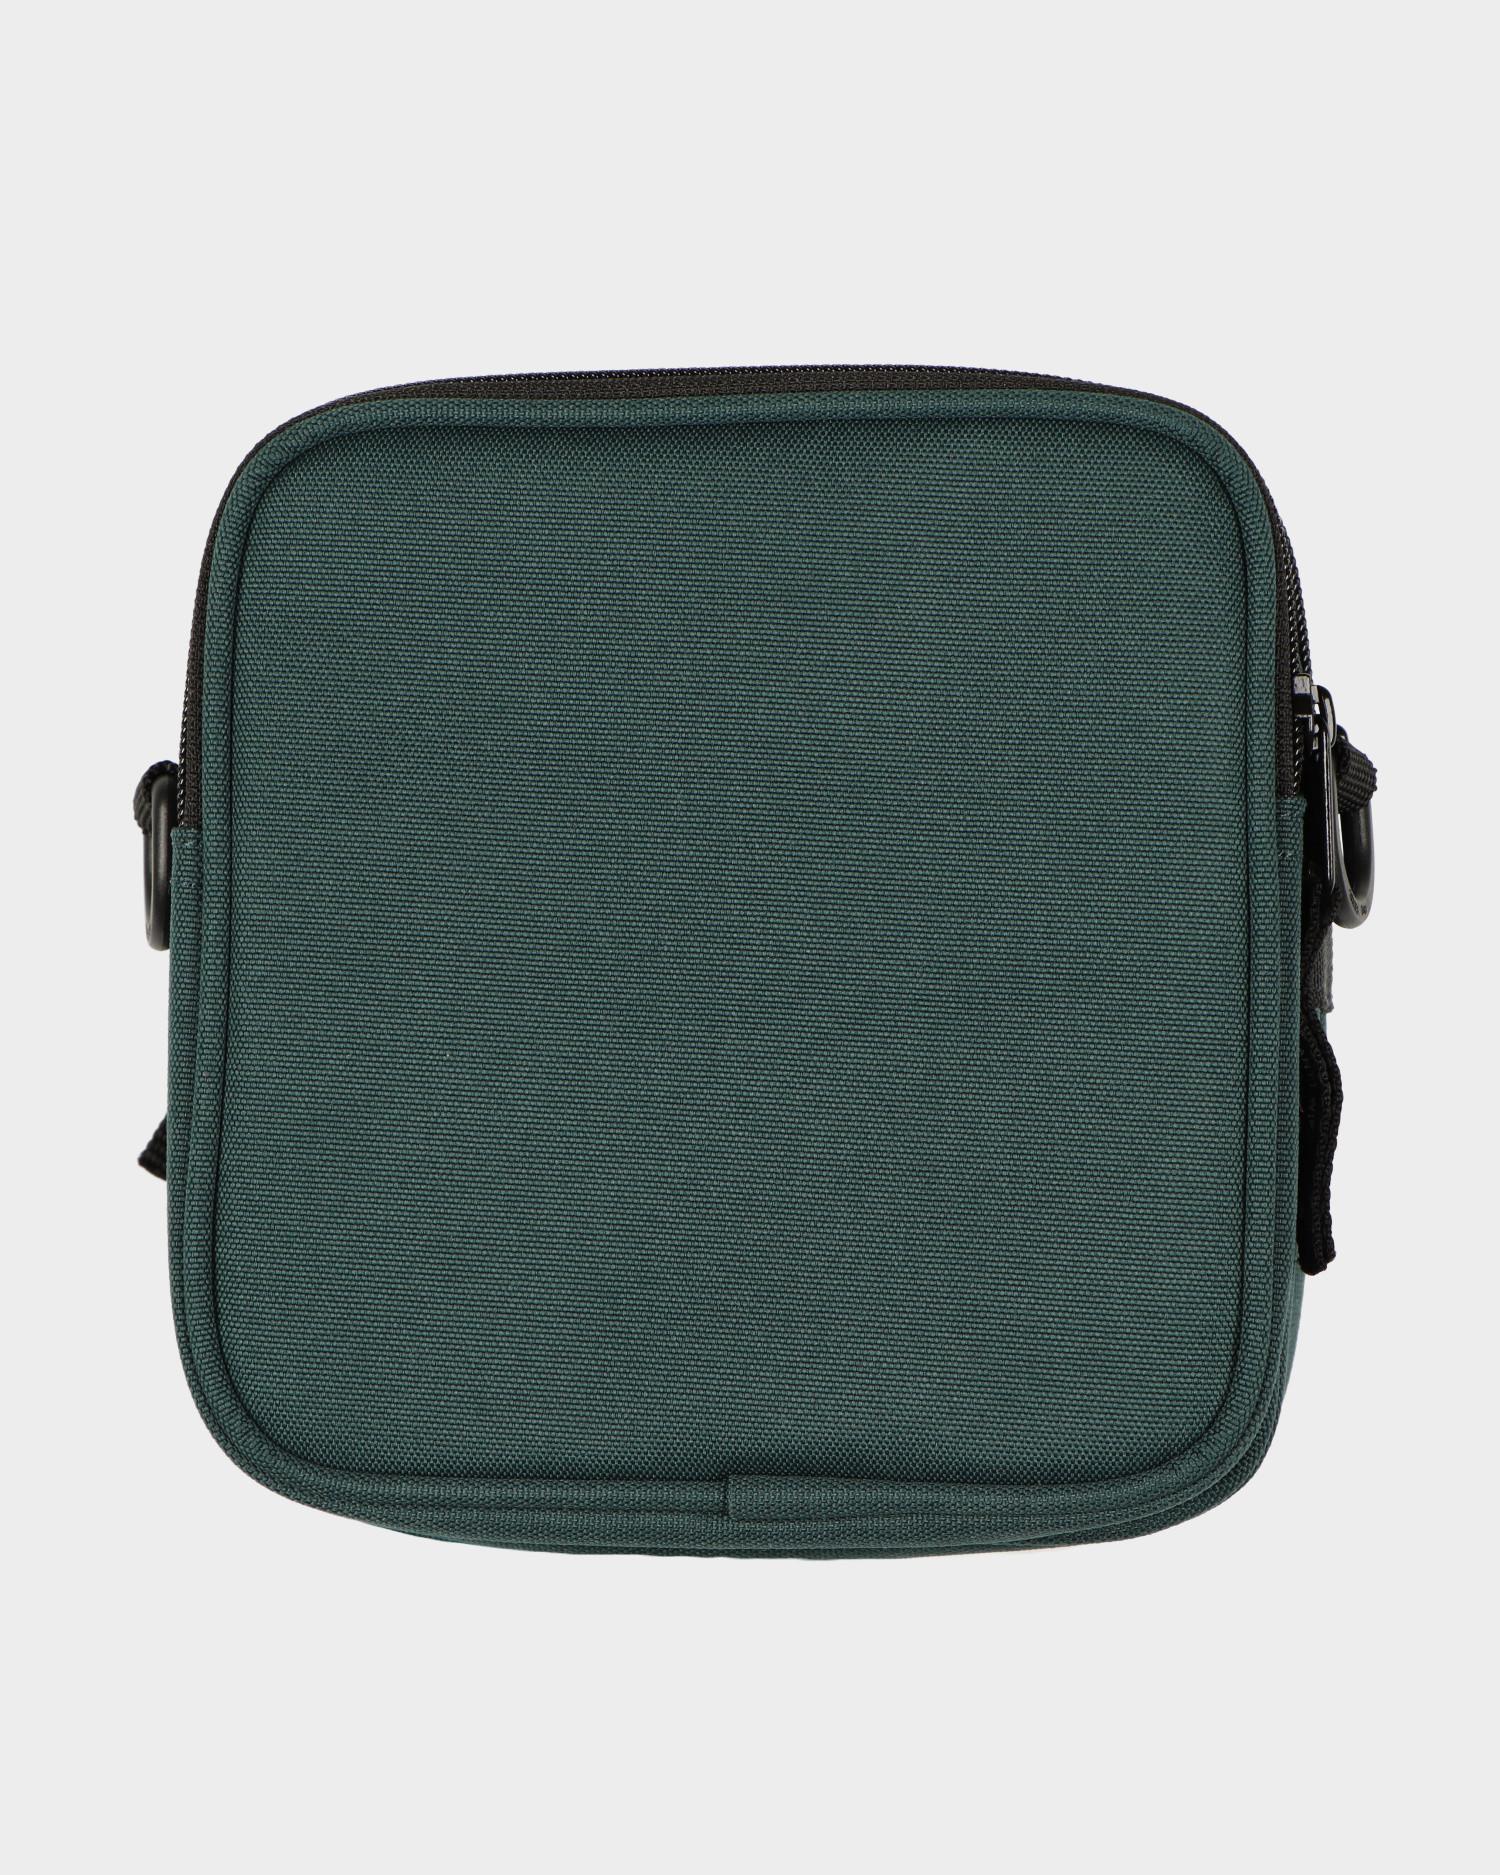 Carhartt Essentials Bag Small 100% Polyester Duck Canvas Multicolor